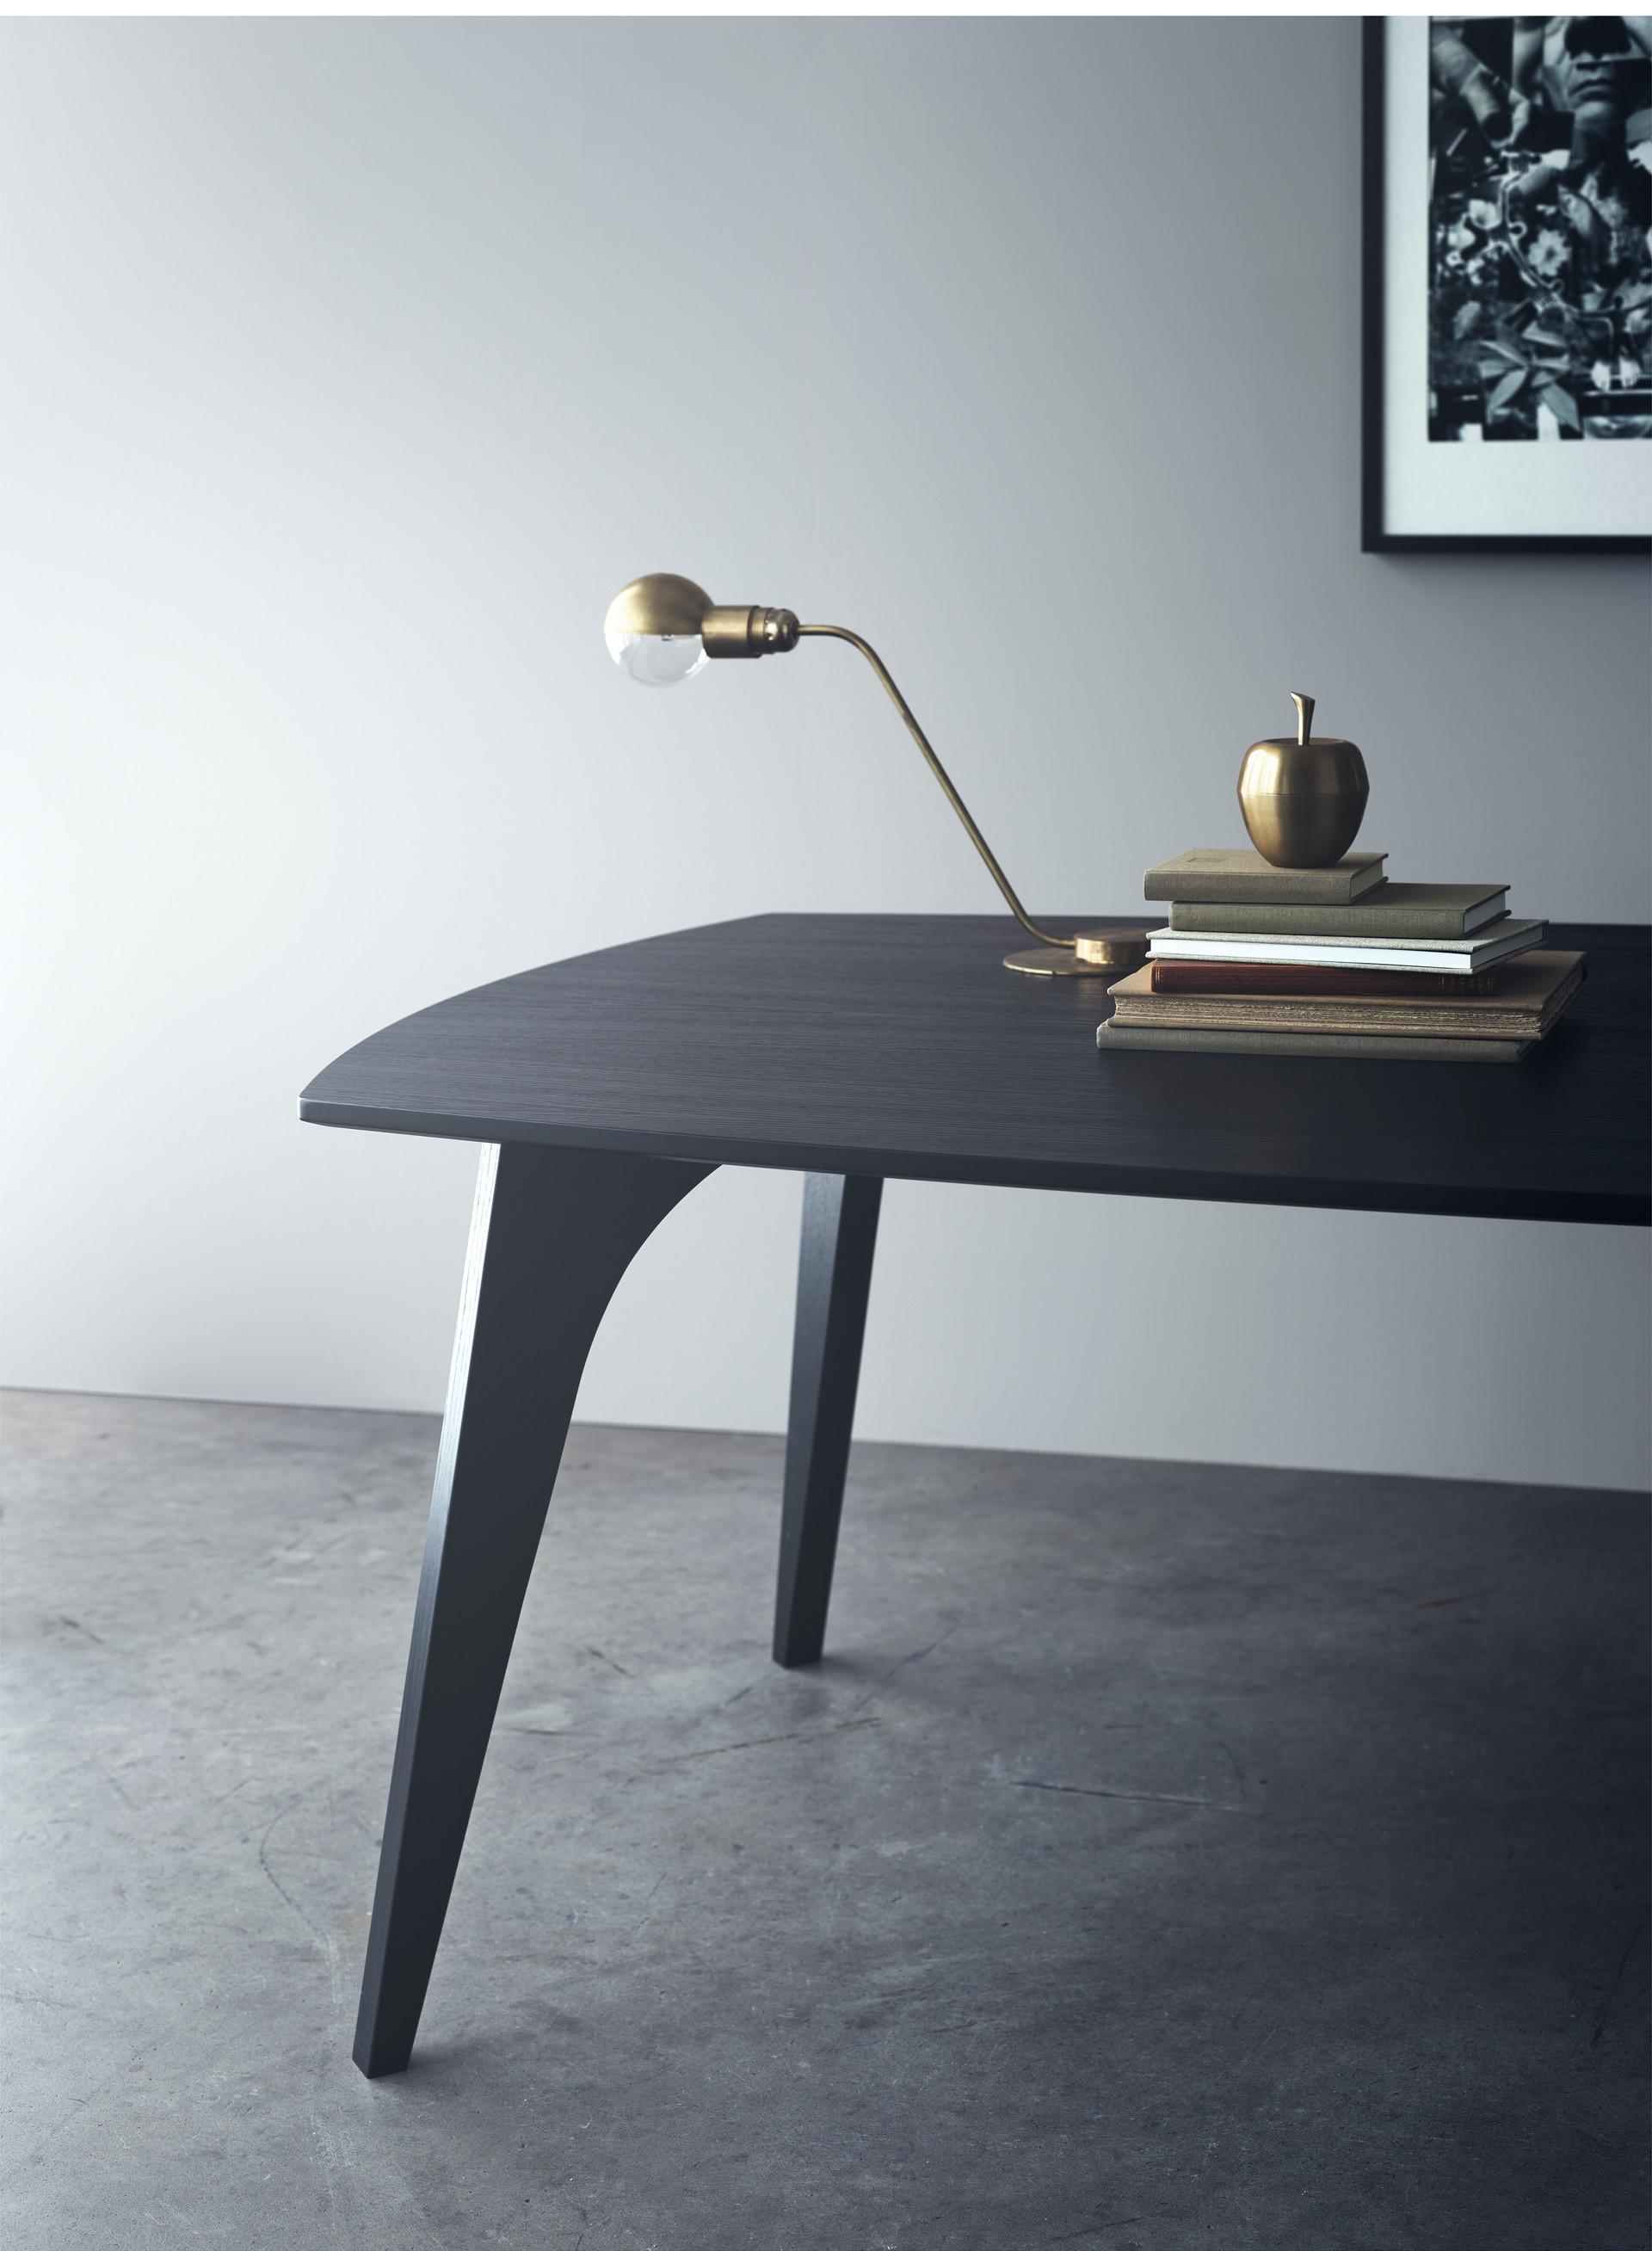 erik_bagger_furniture_Michael_Rygaard3.jpg